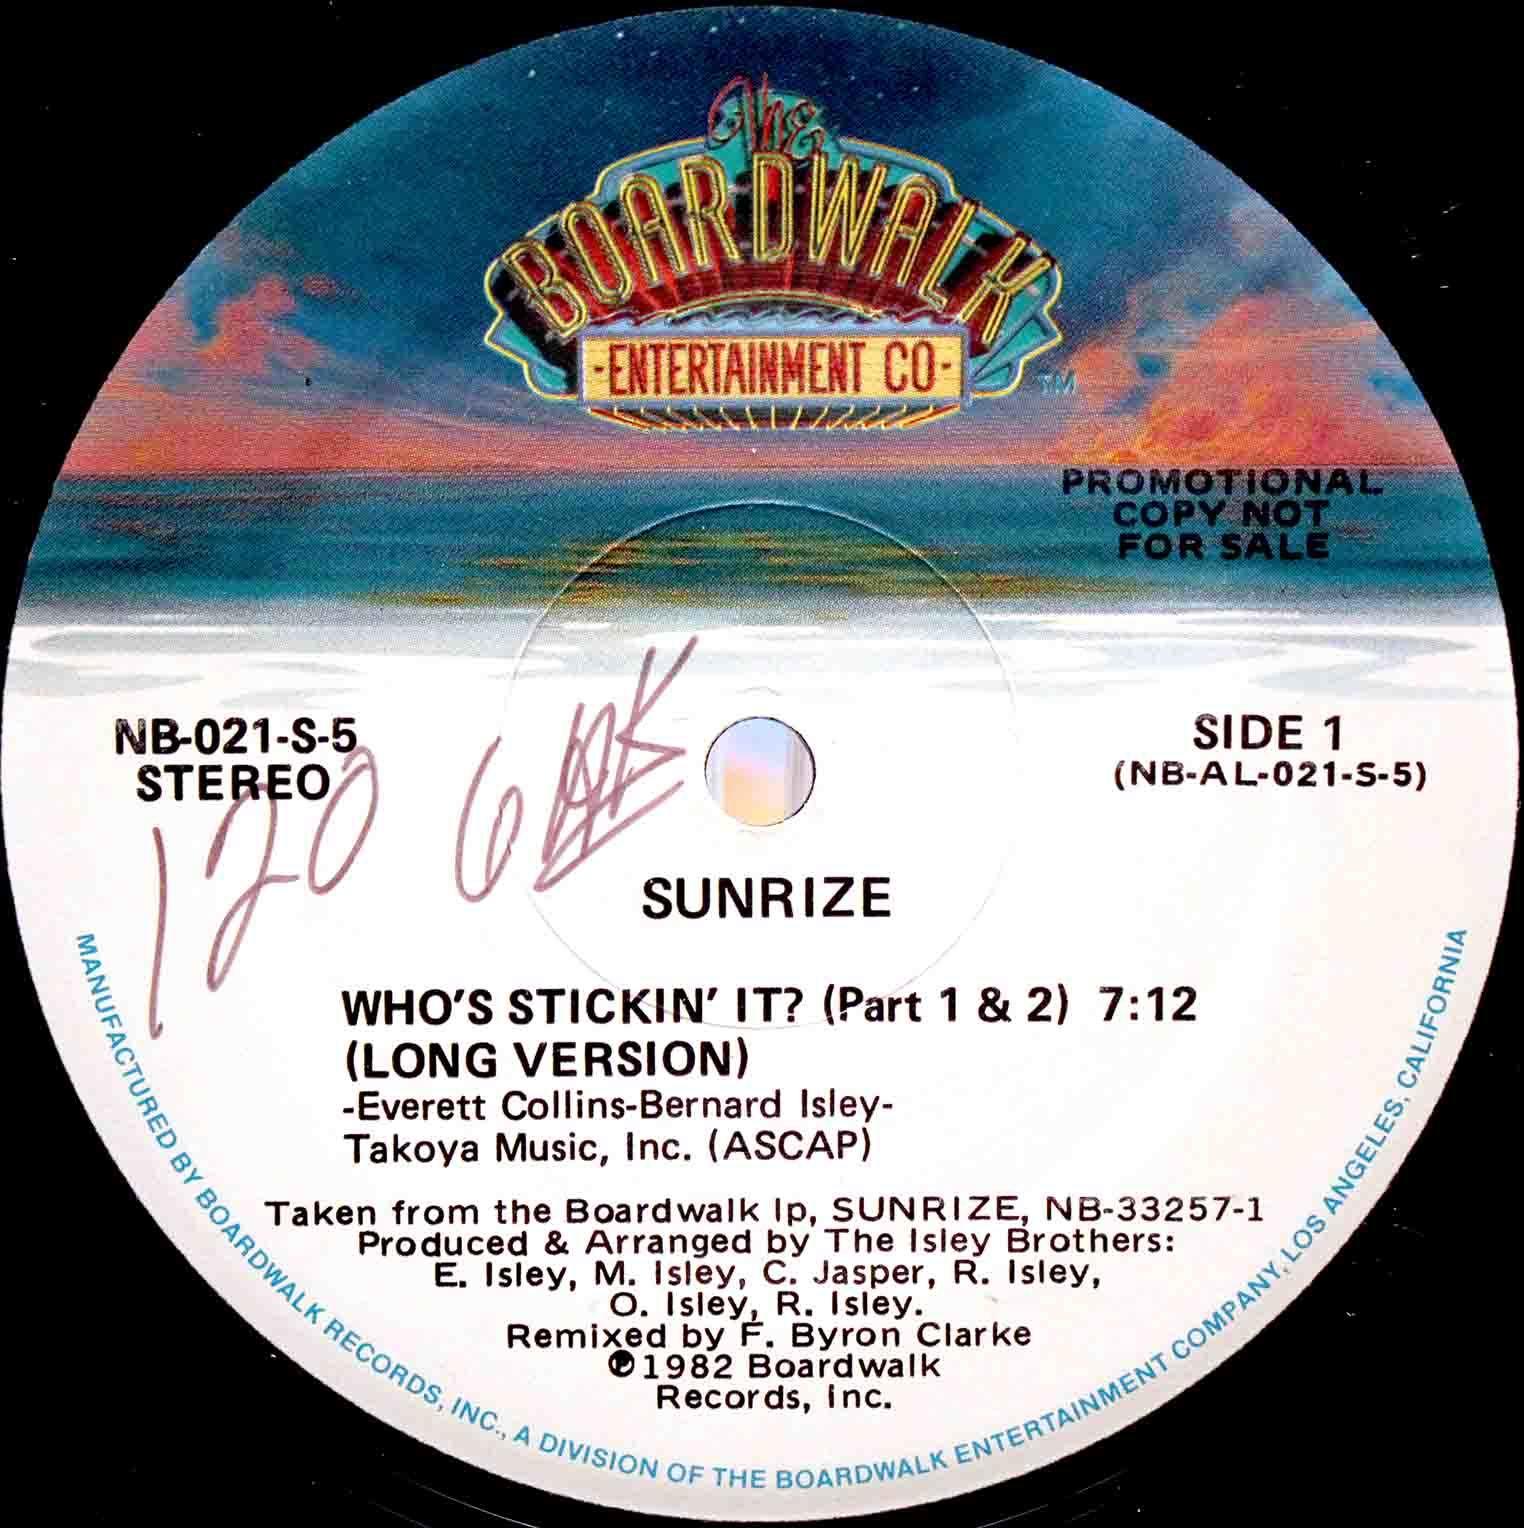 Sunrize Whos Stickin It 03